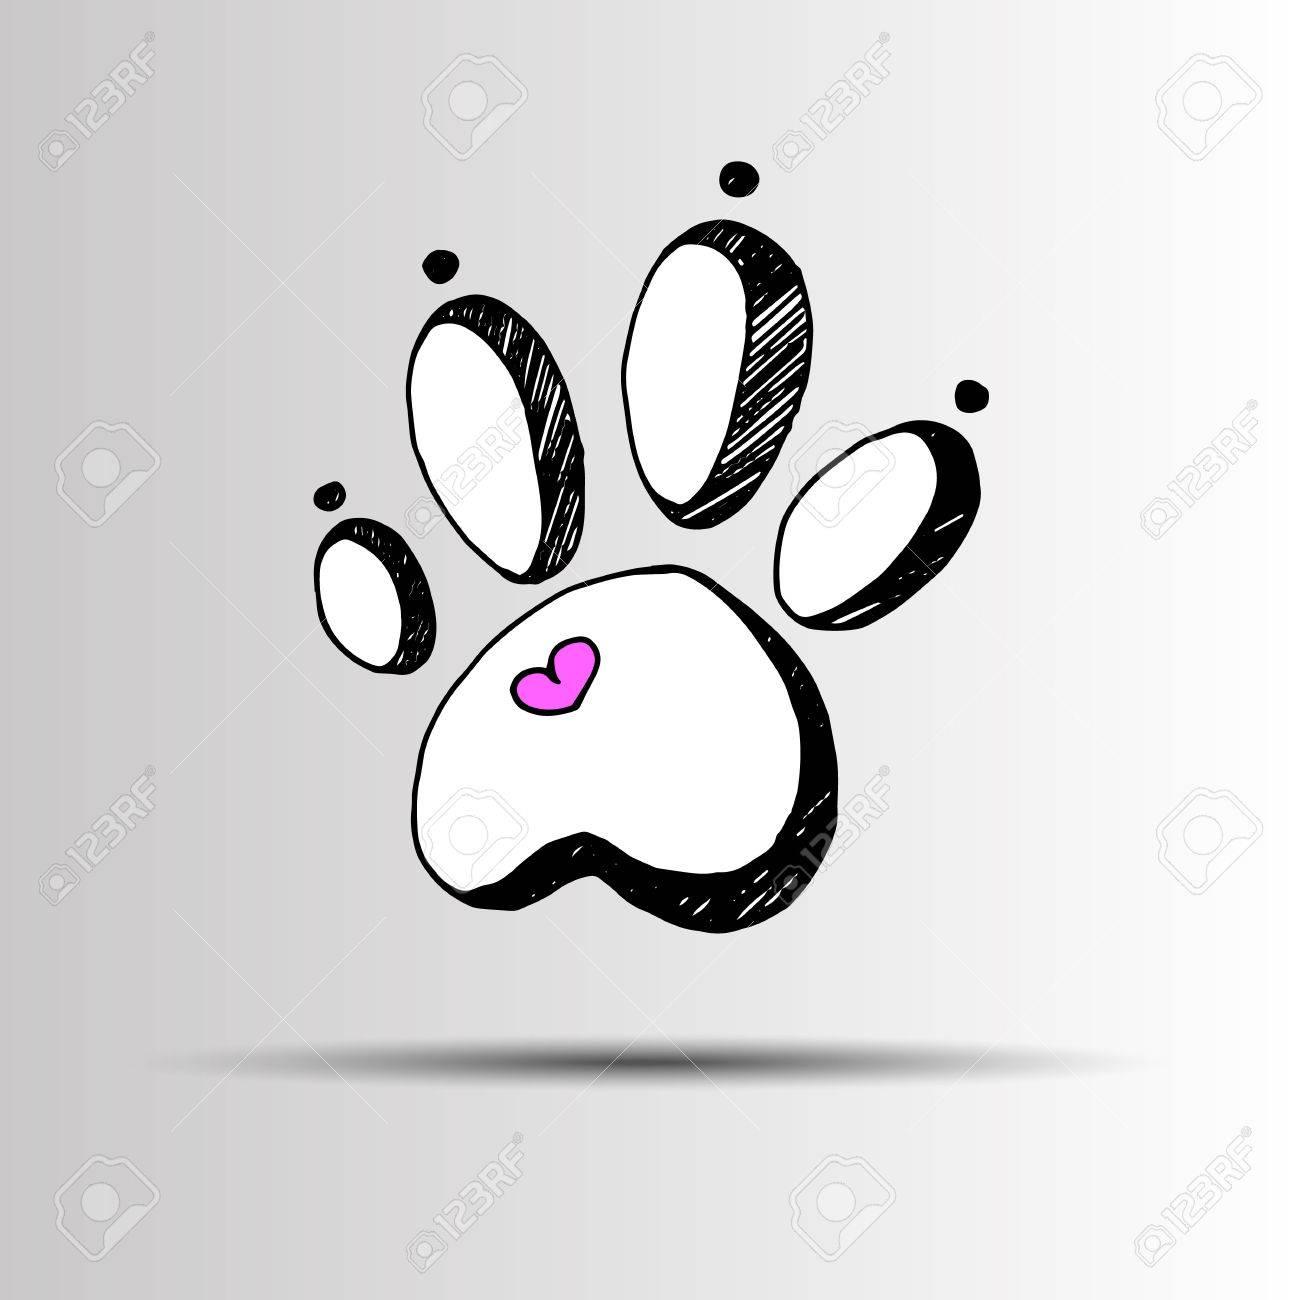 Relativ Empreinte De Chien Impression Patte Pied Forme Illustration Animal  HI09